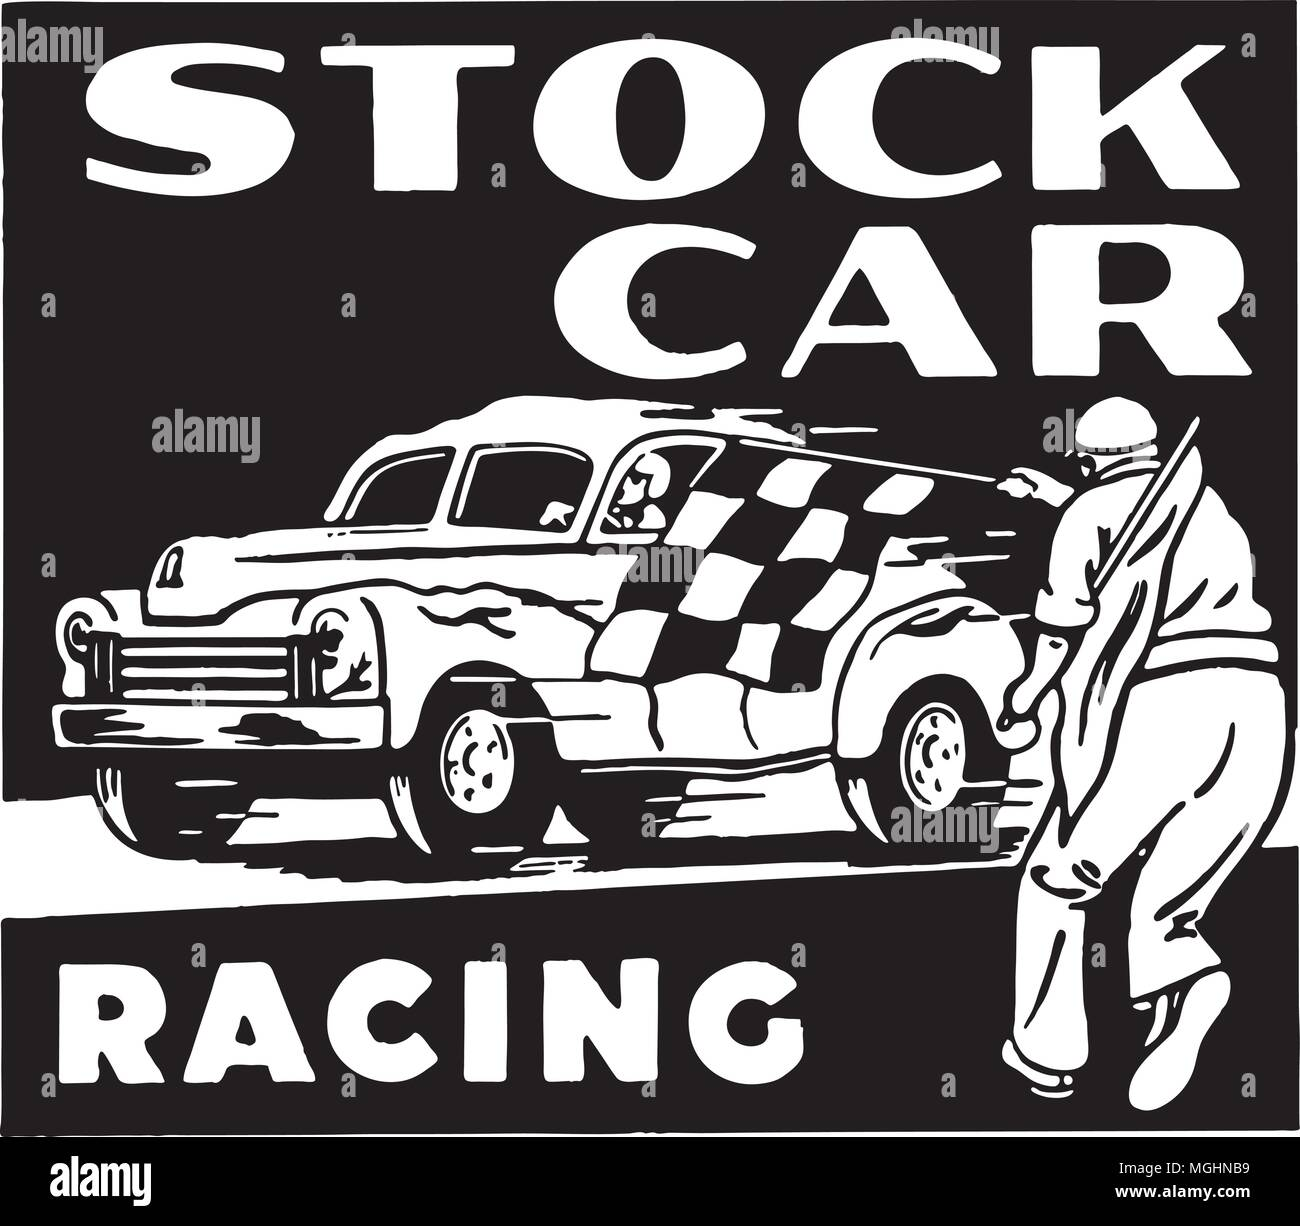 Stock Car Racing - Retro Ad Art Banner - Stock Vector